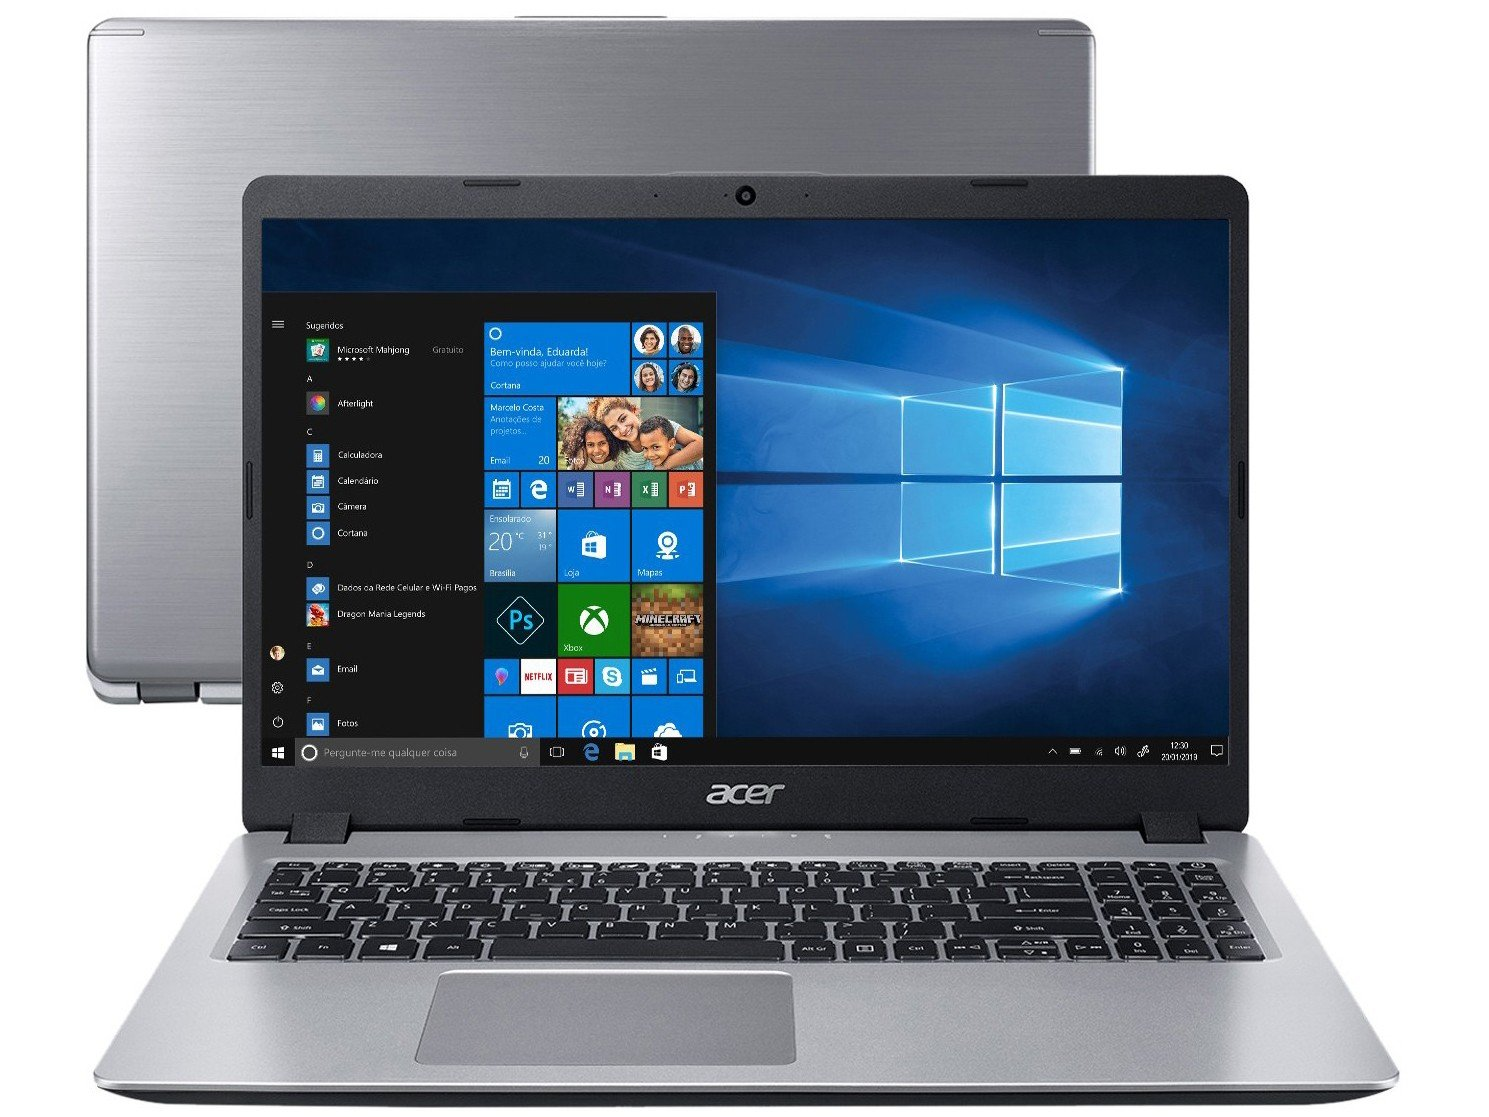 "Notebook Acer Aspire 5 A515-52-536H Intel Core i5 - 8GB SSD 256GB 15,6"" Windows 10 - Bivolt"